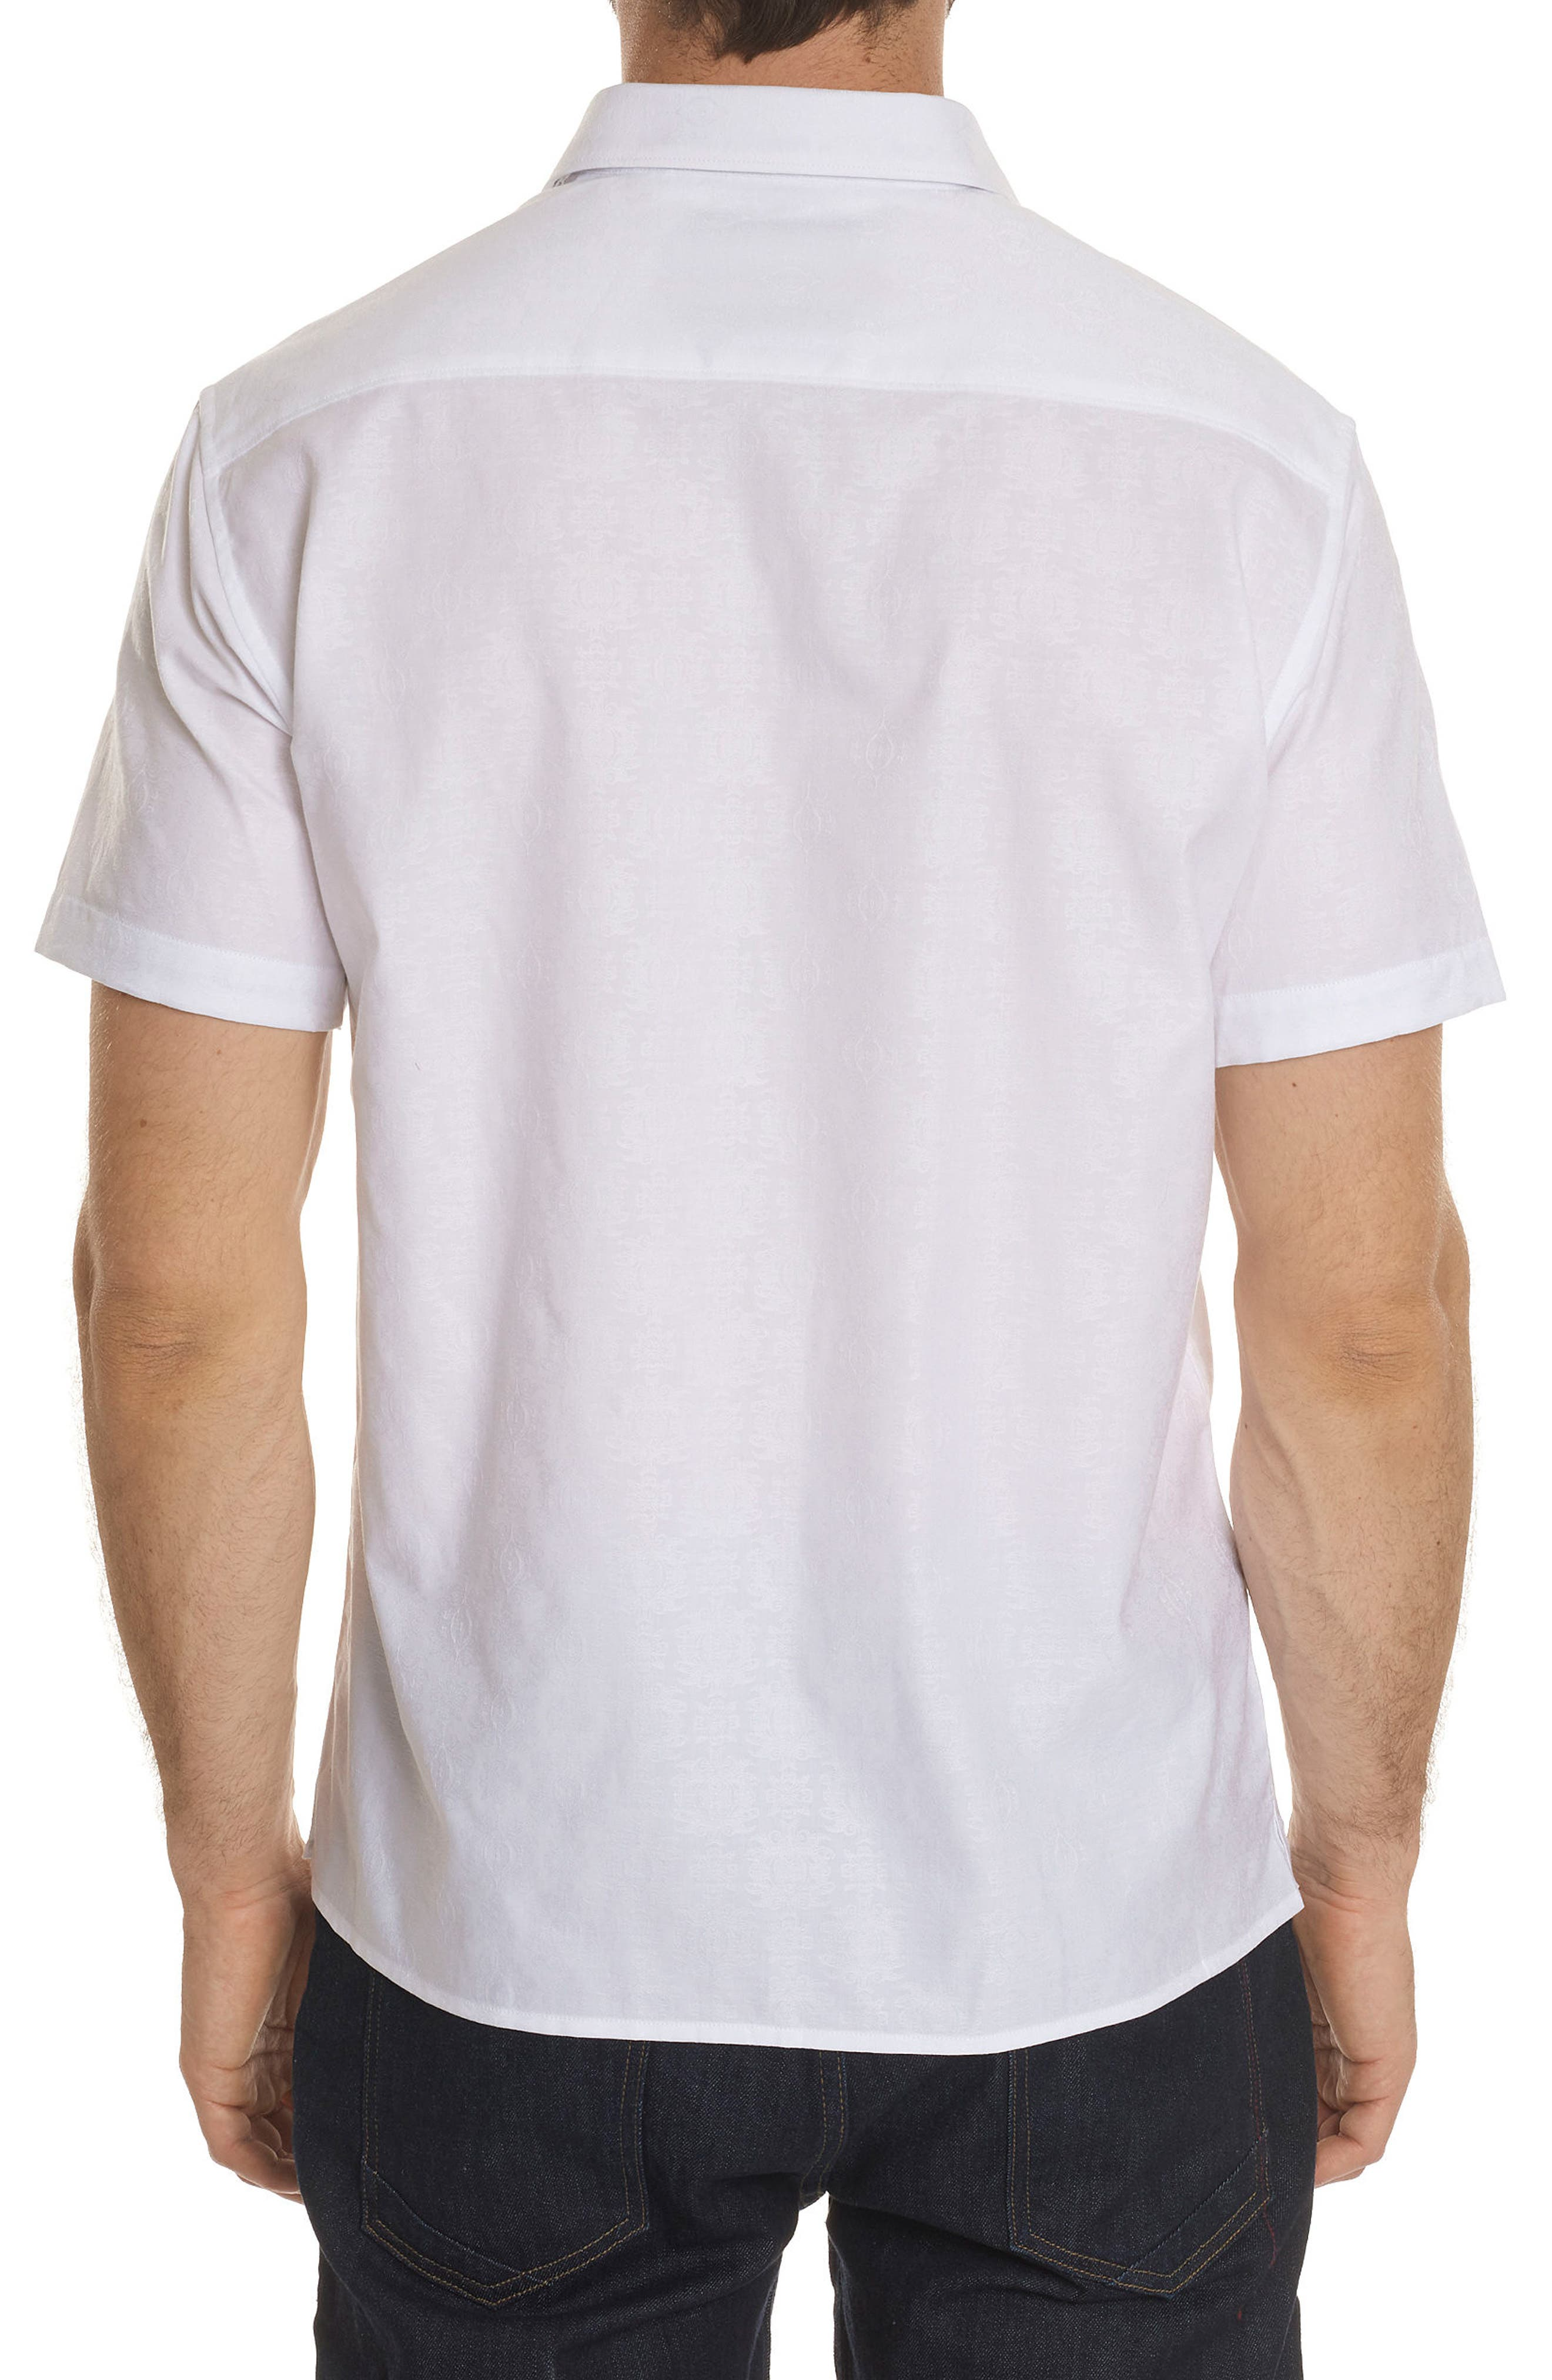 Cullen Squared Regular Fit Short Sleeve Sport Shirt,                             Alternate thumbnail 2, color,                             100